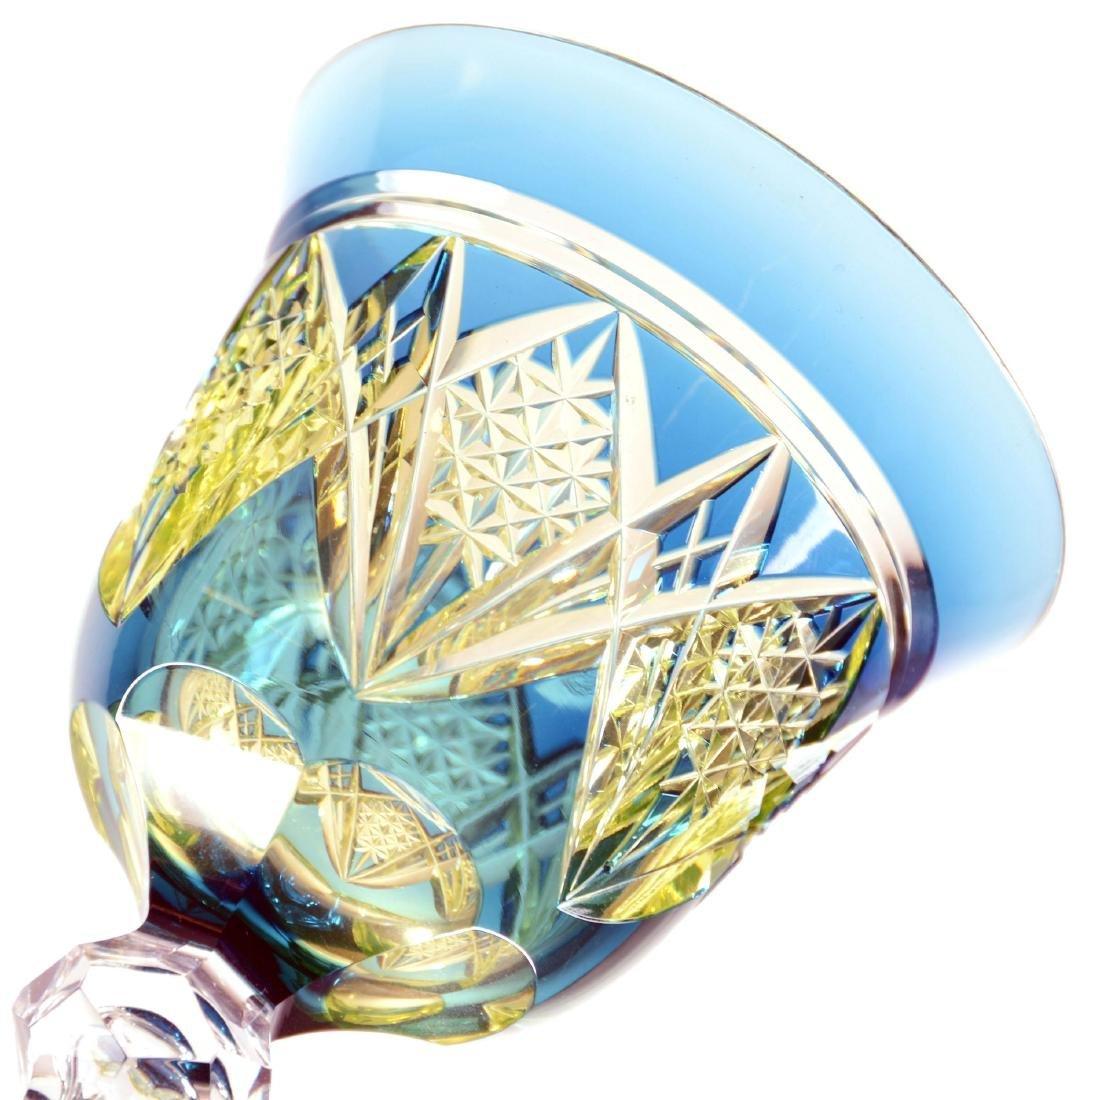 "Rhine Wine - 7.375"" - Blue Cut to Vaseline - 2"